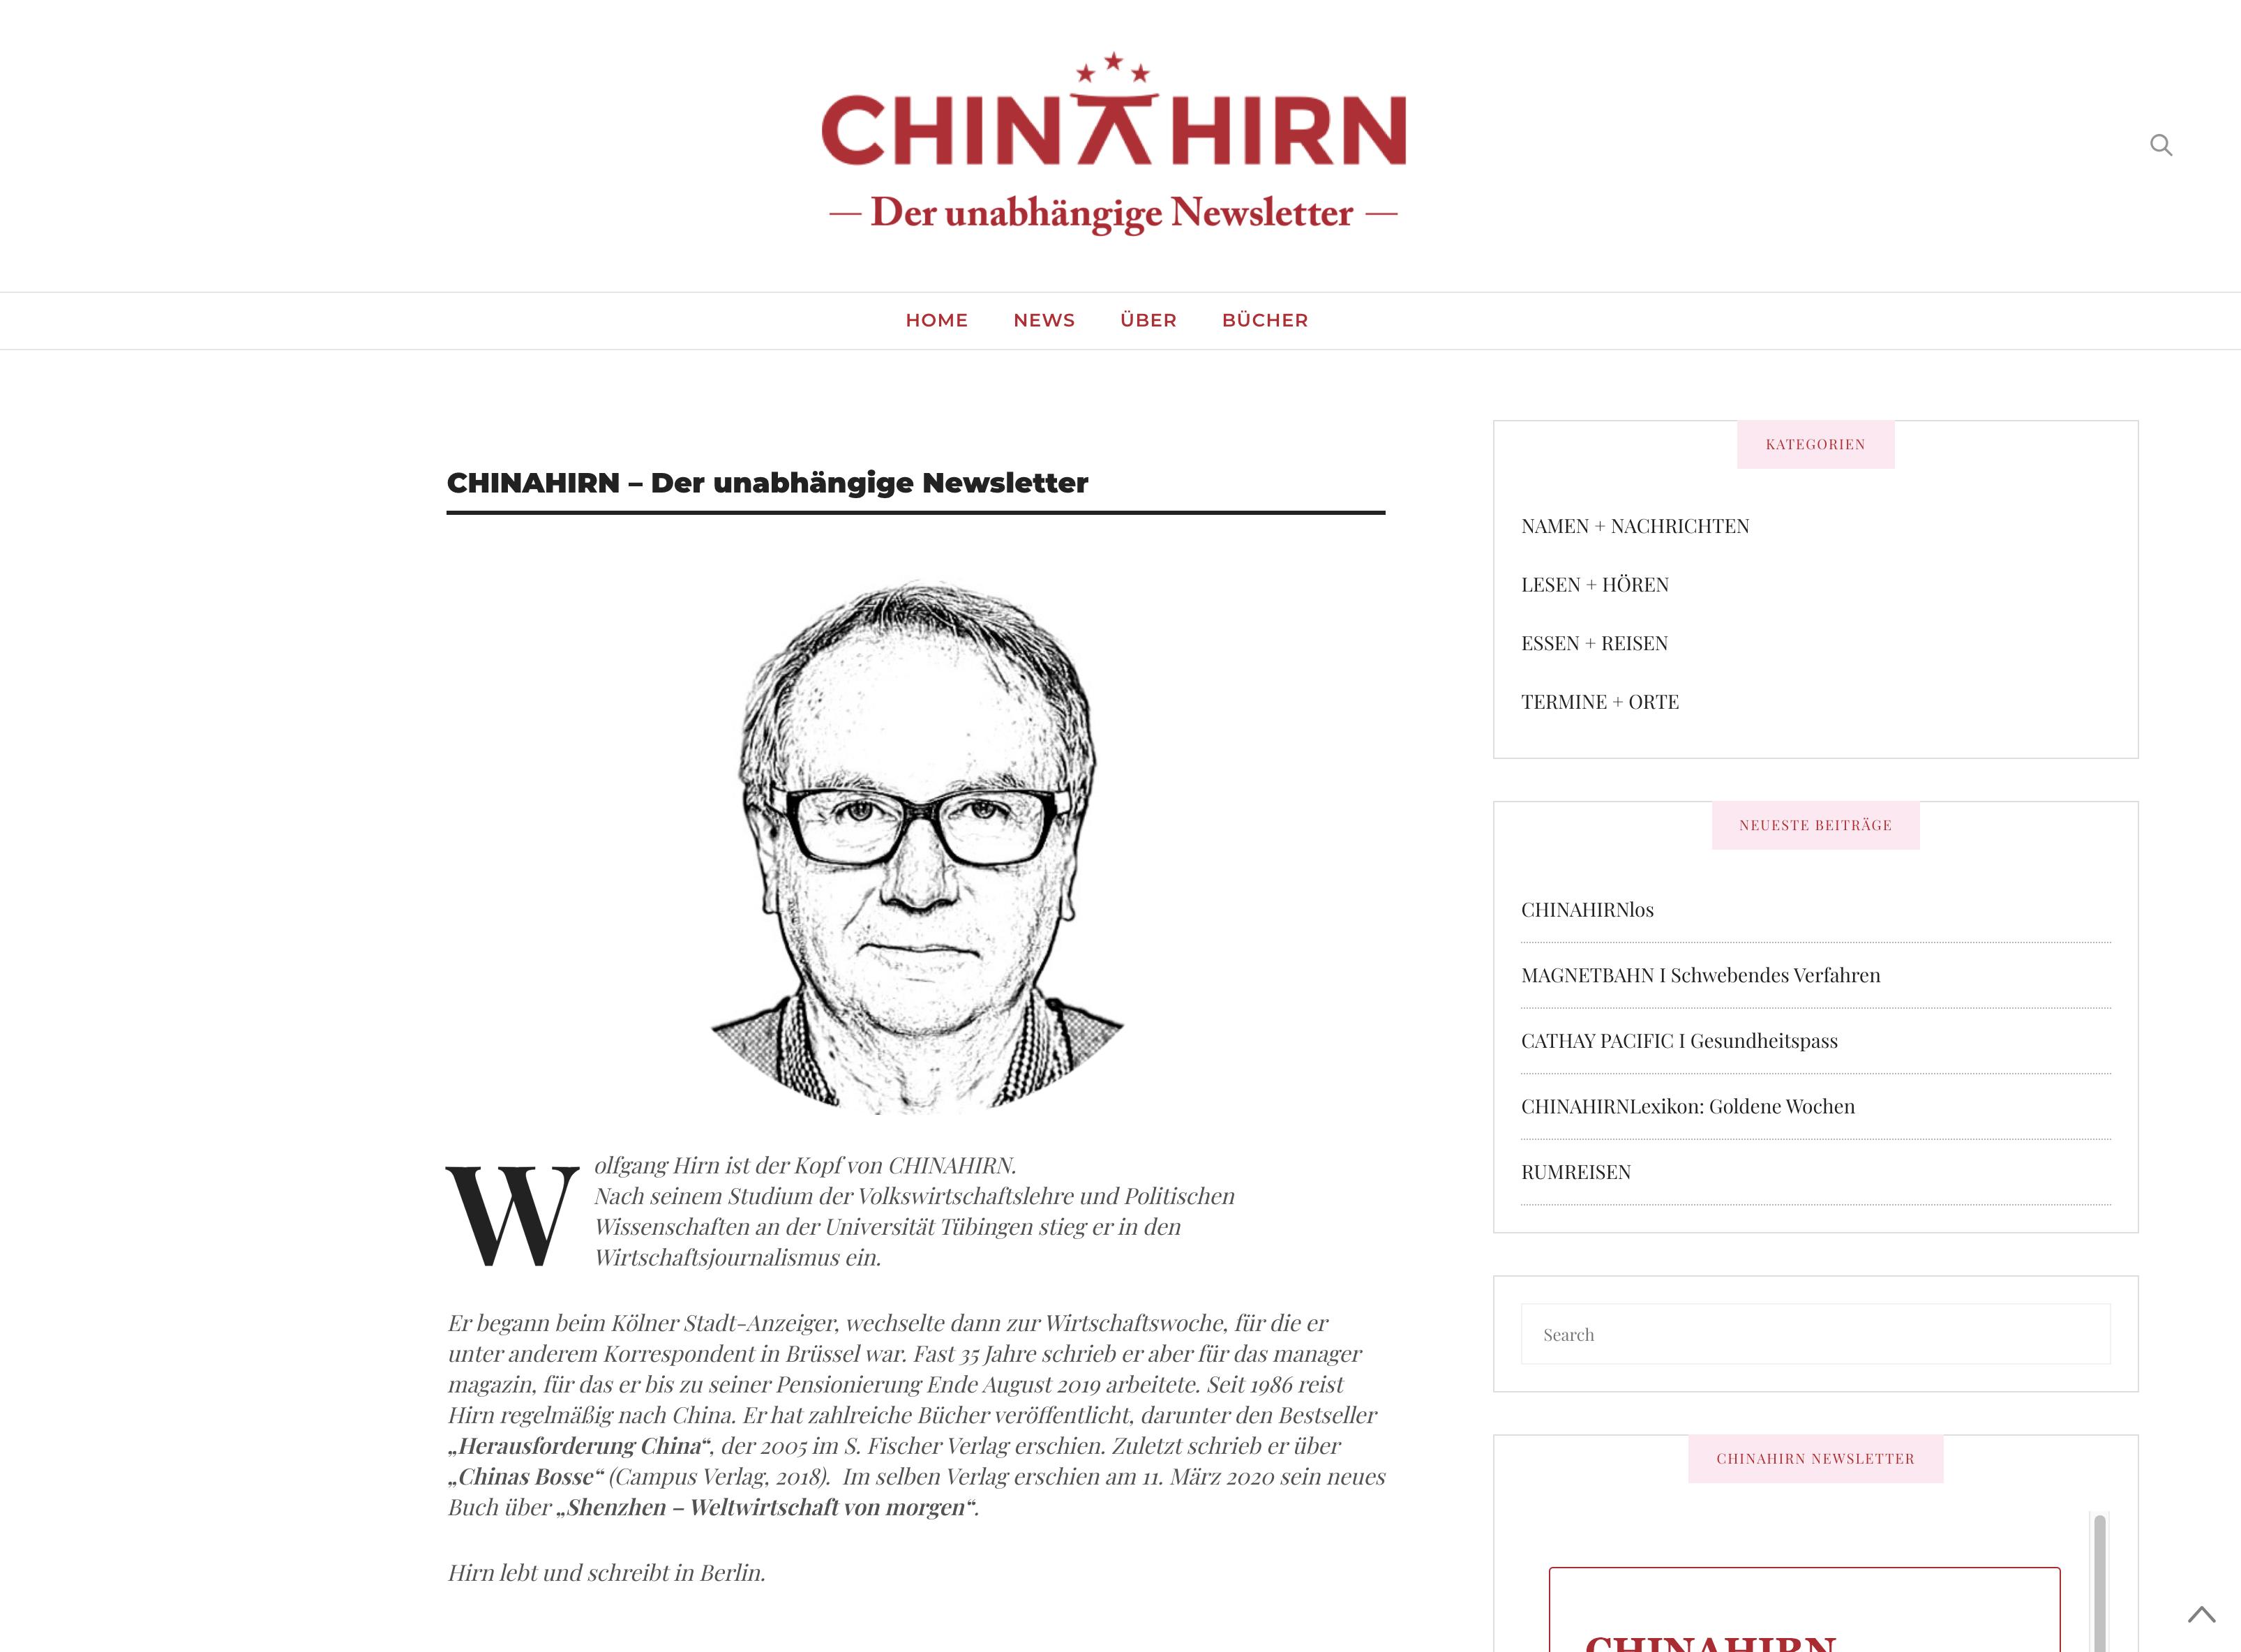 CHINAHIRN der unabhaengige Newsletter wolfgang hirn manager magazin